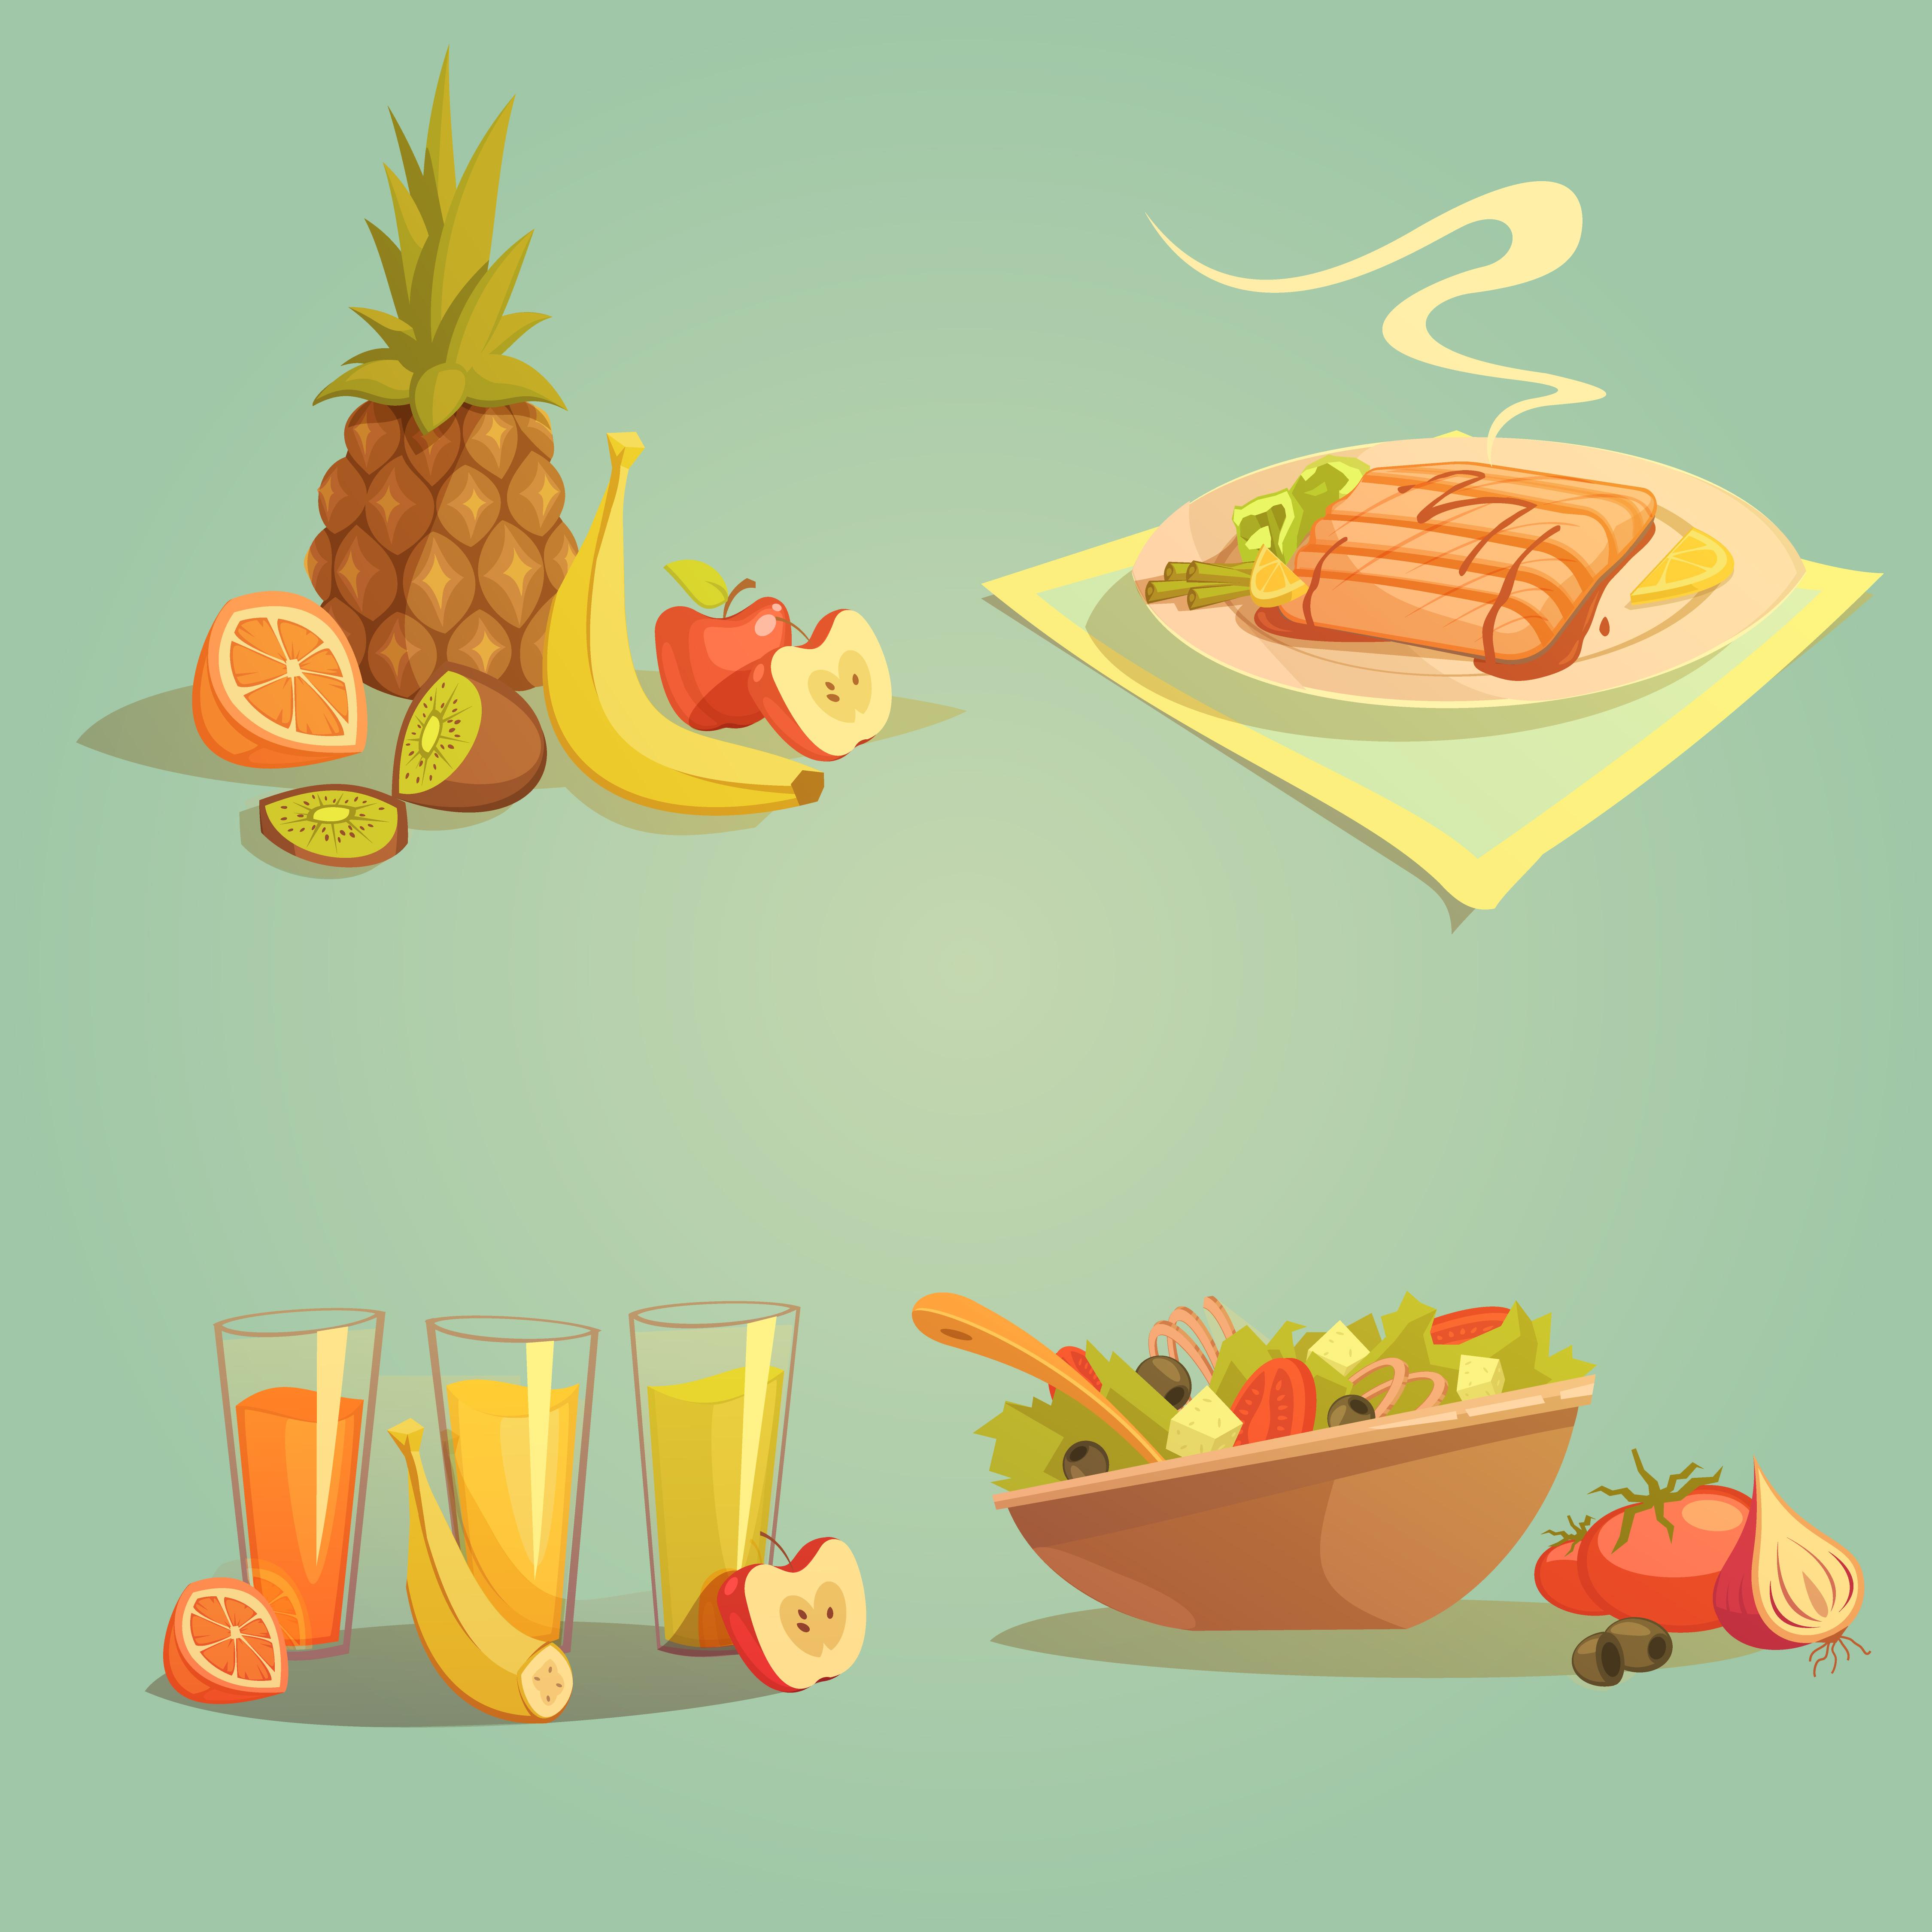 cartoon food healthy drinks vector freepik vecteezy fruit clipart background royalty graphics illustration jemastock